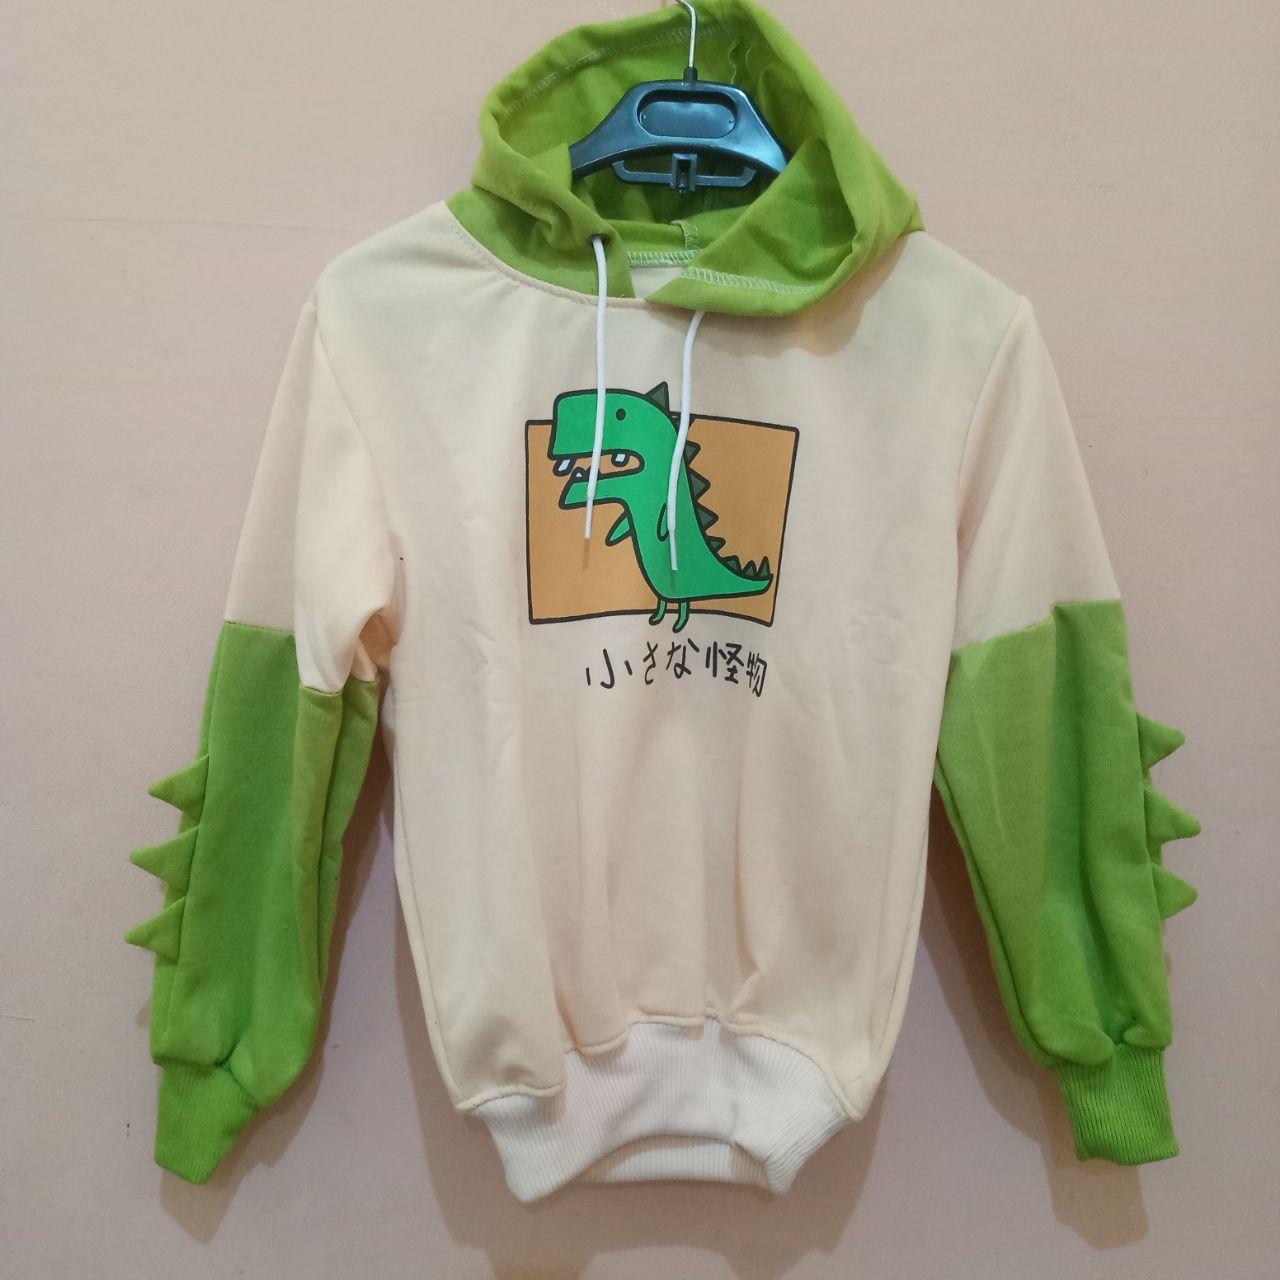 ini adalah Jaket Anak Dinosaurus Cream, size: LD +- 78cm, material: Fleece, color: Cream, brand: Jaket Anak Indonesia, age_group: kids, gender: unisex